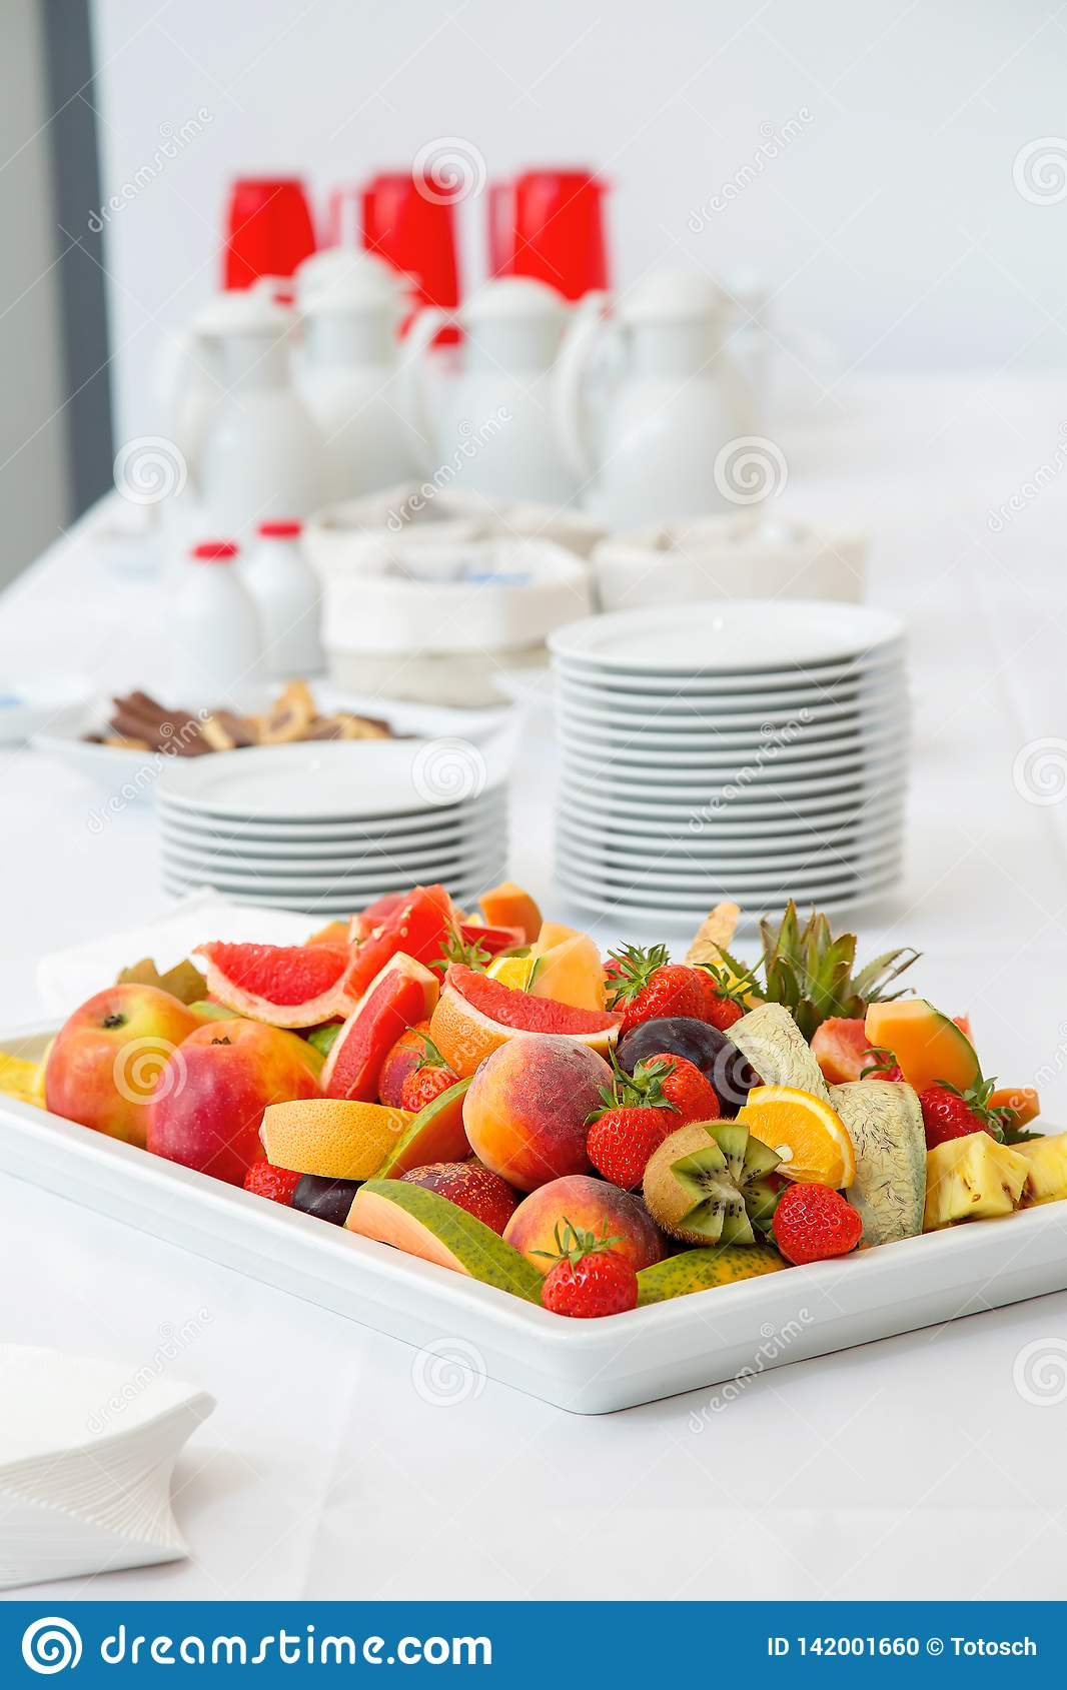 Breakfast buffet - fruits, coffee and tea